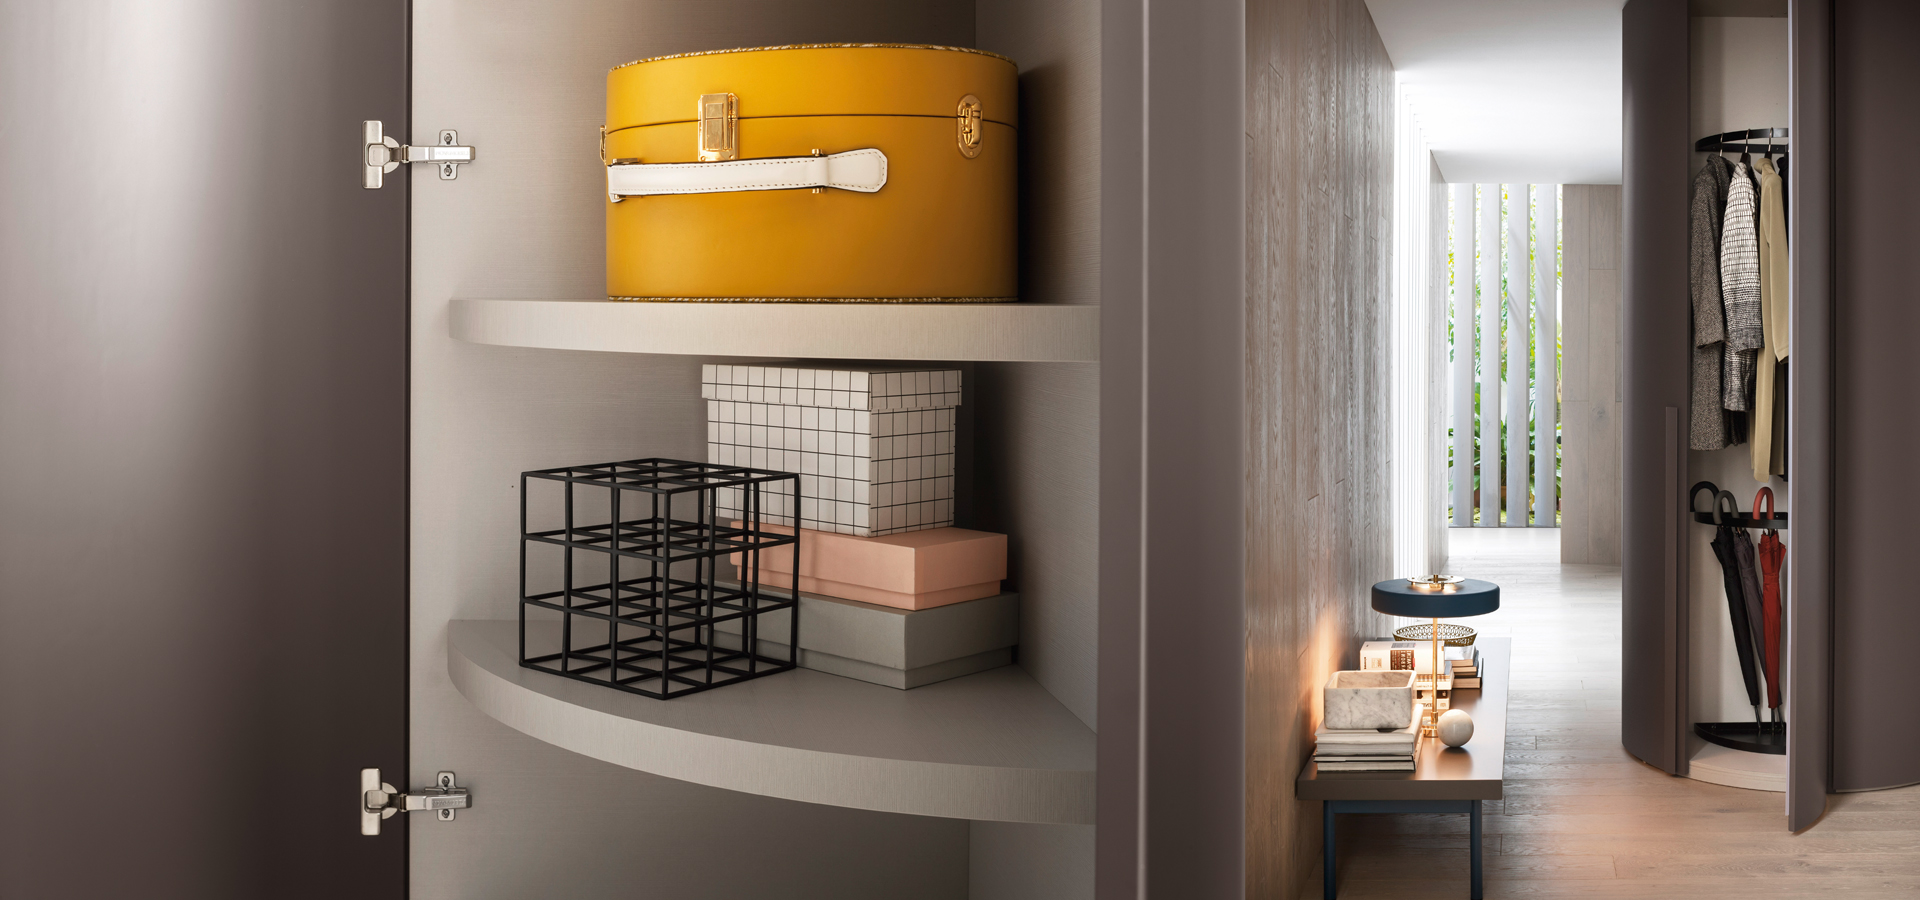 Alfa curved wardrobe interiors